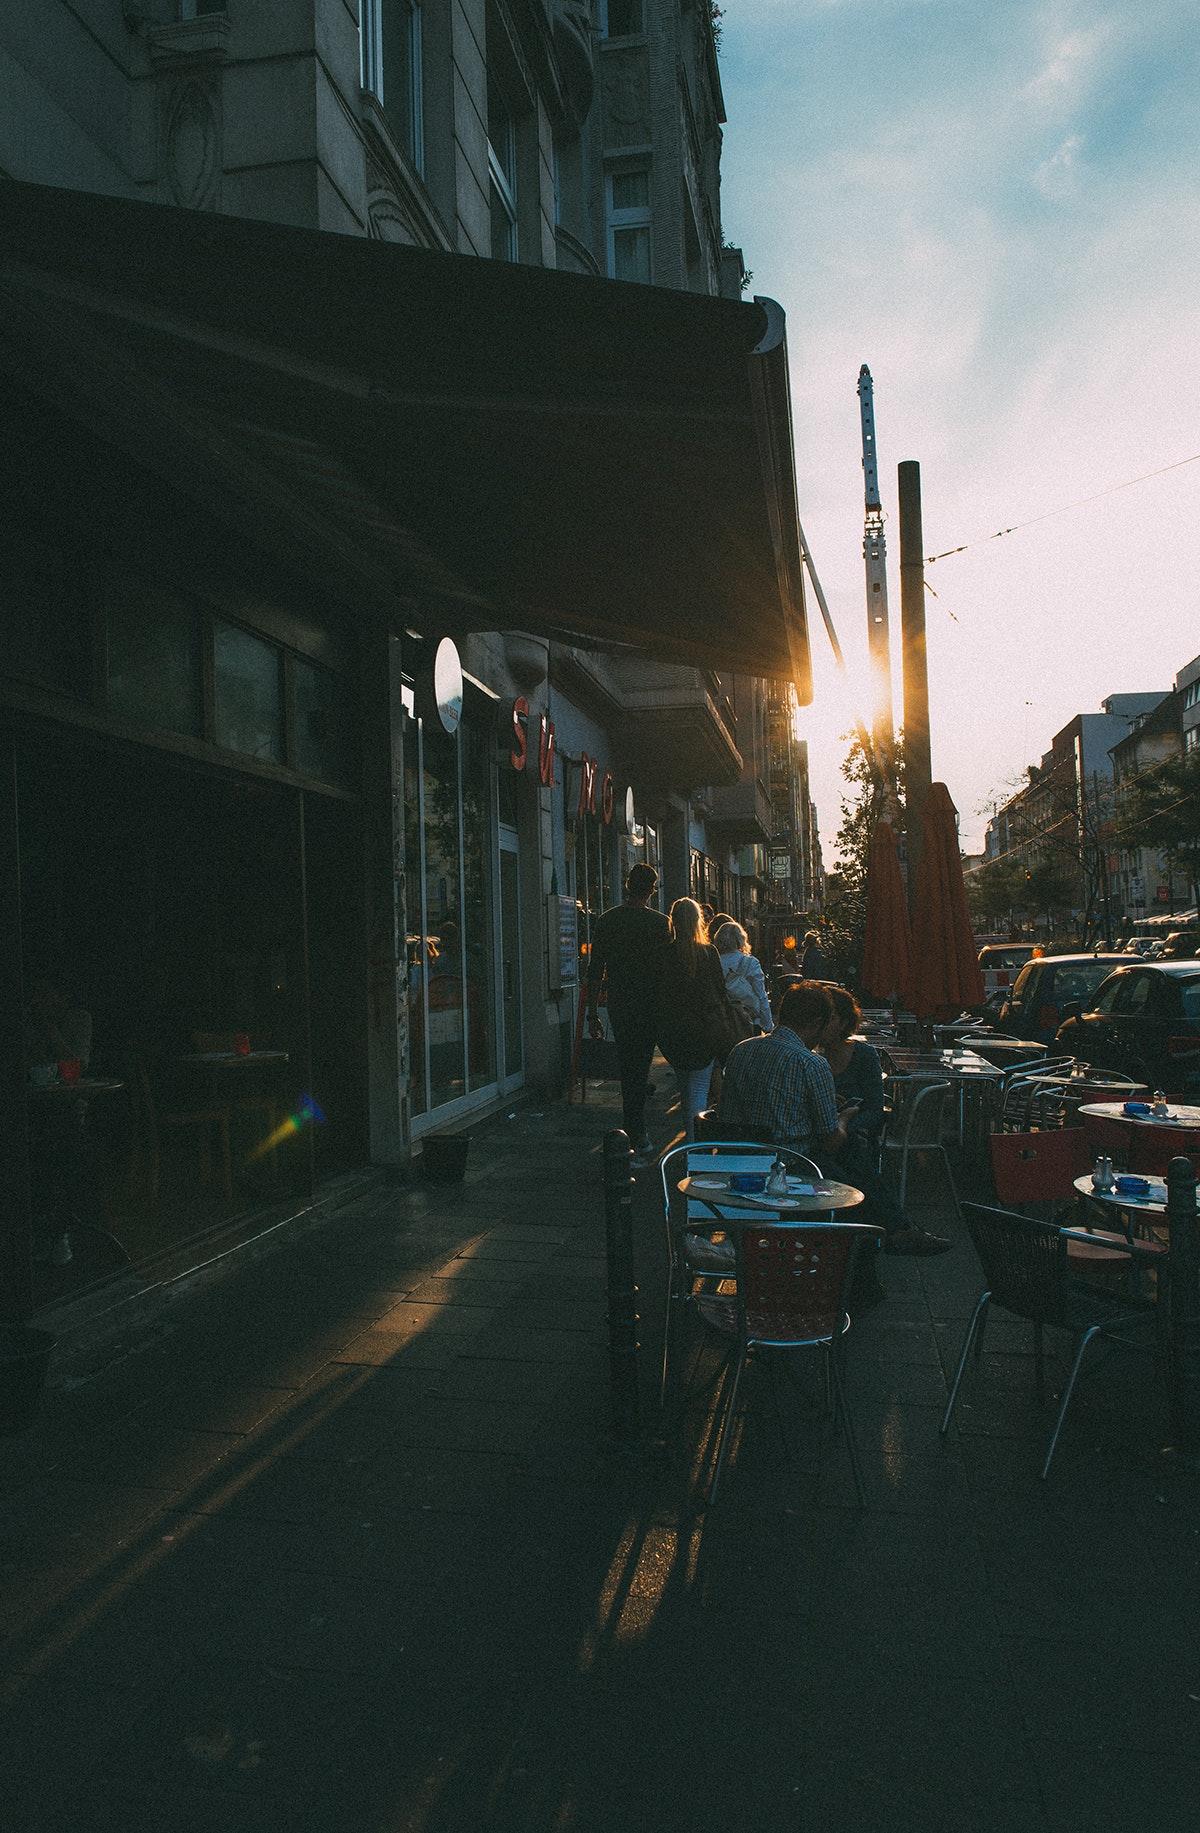 Café Storch